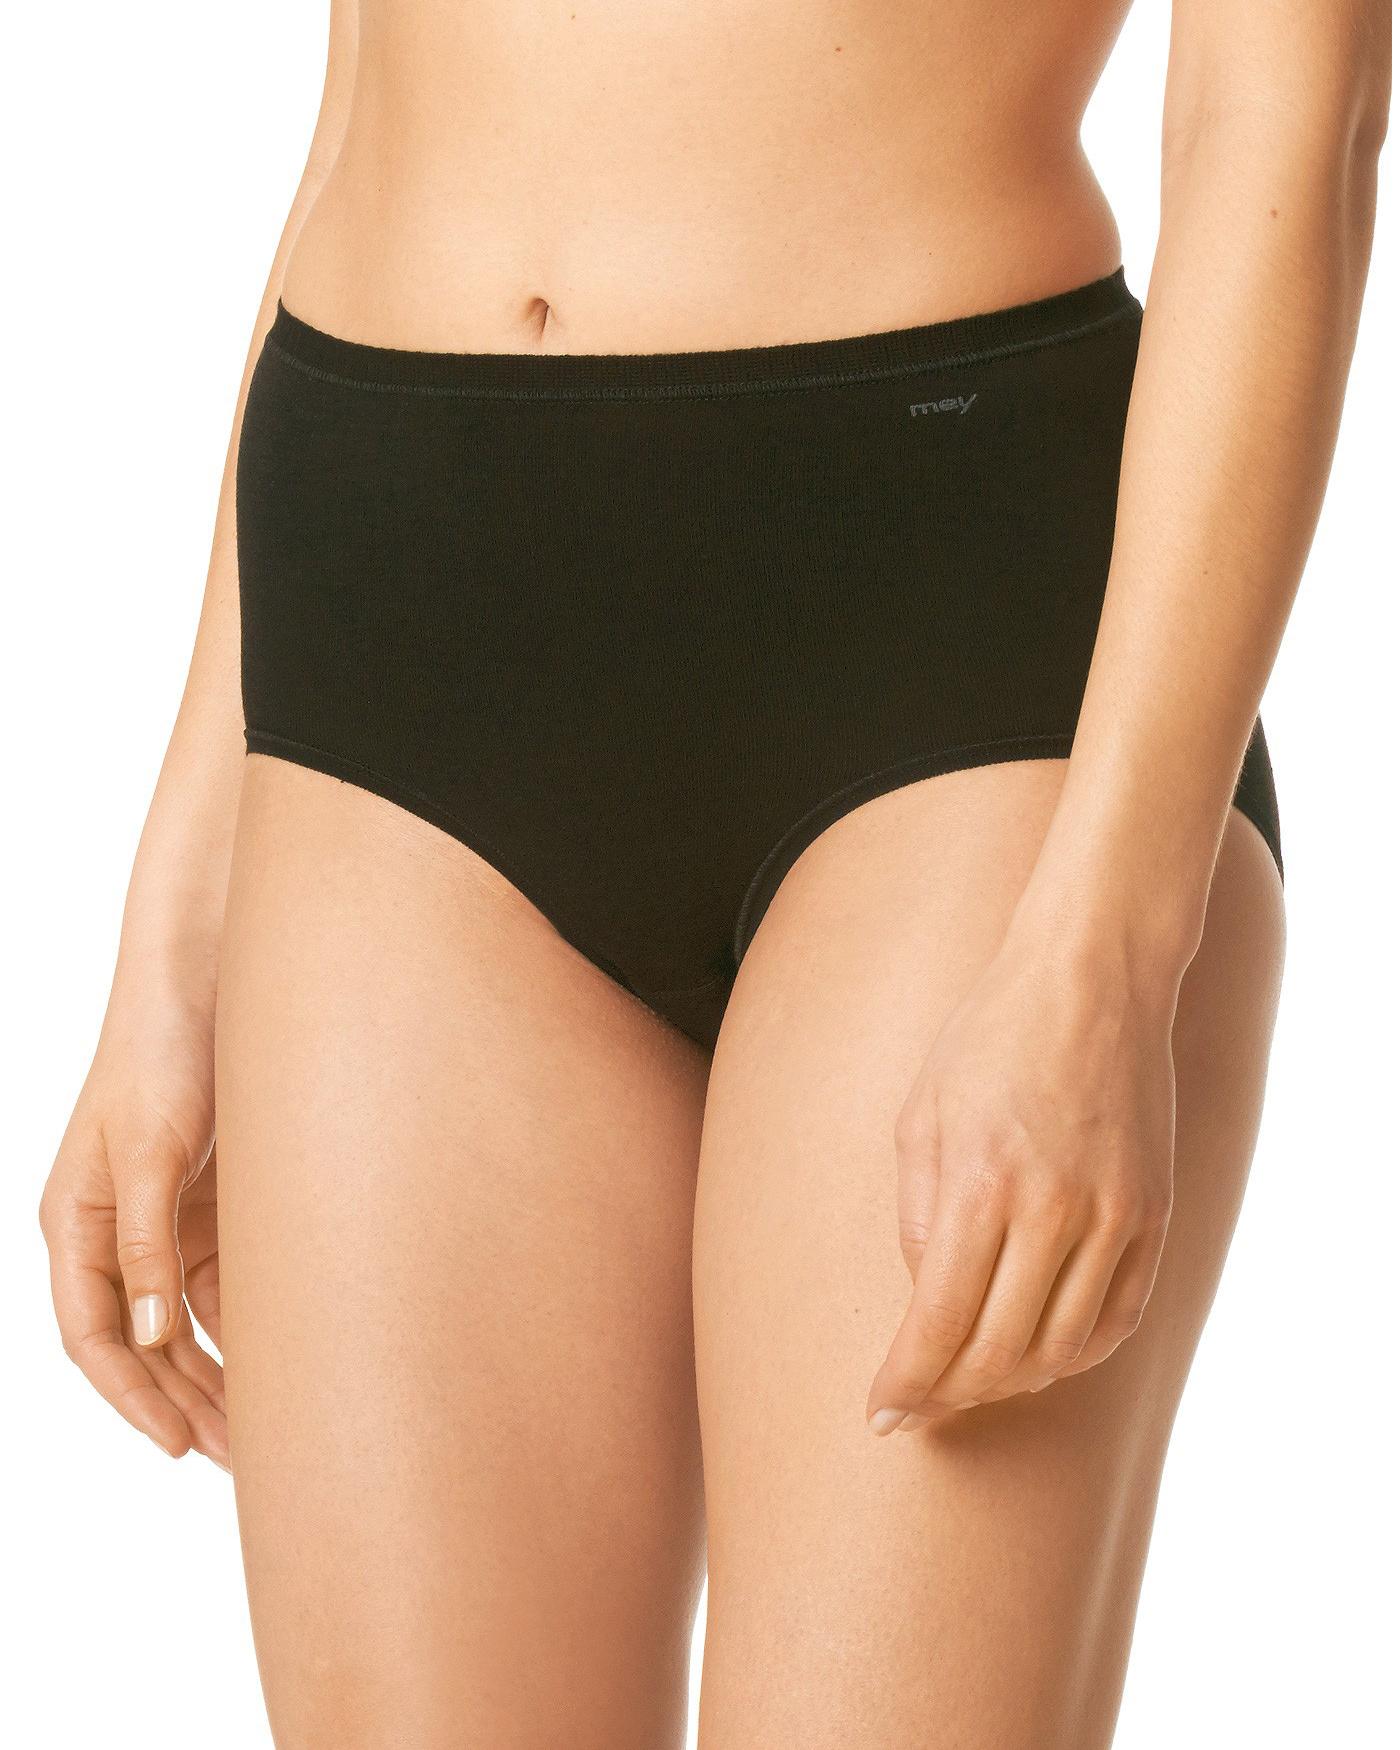 Mey Only Lycra Hight Waist Pants (Black) L-14 фото